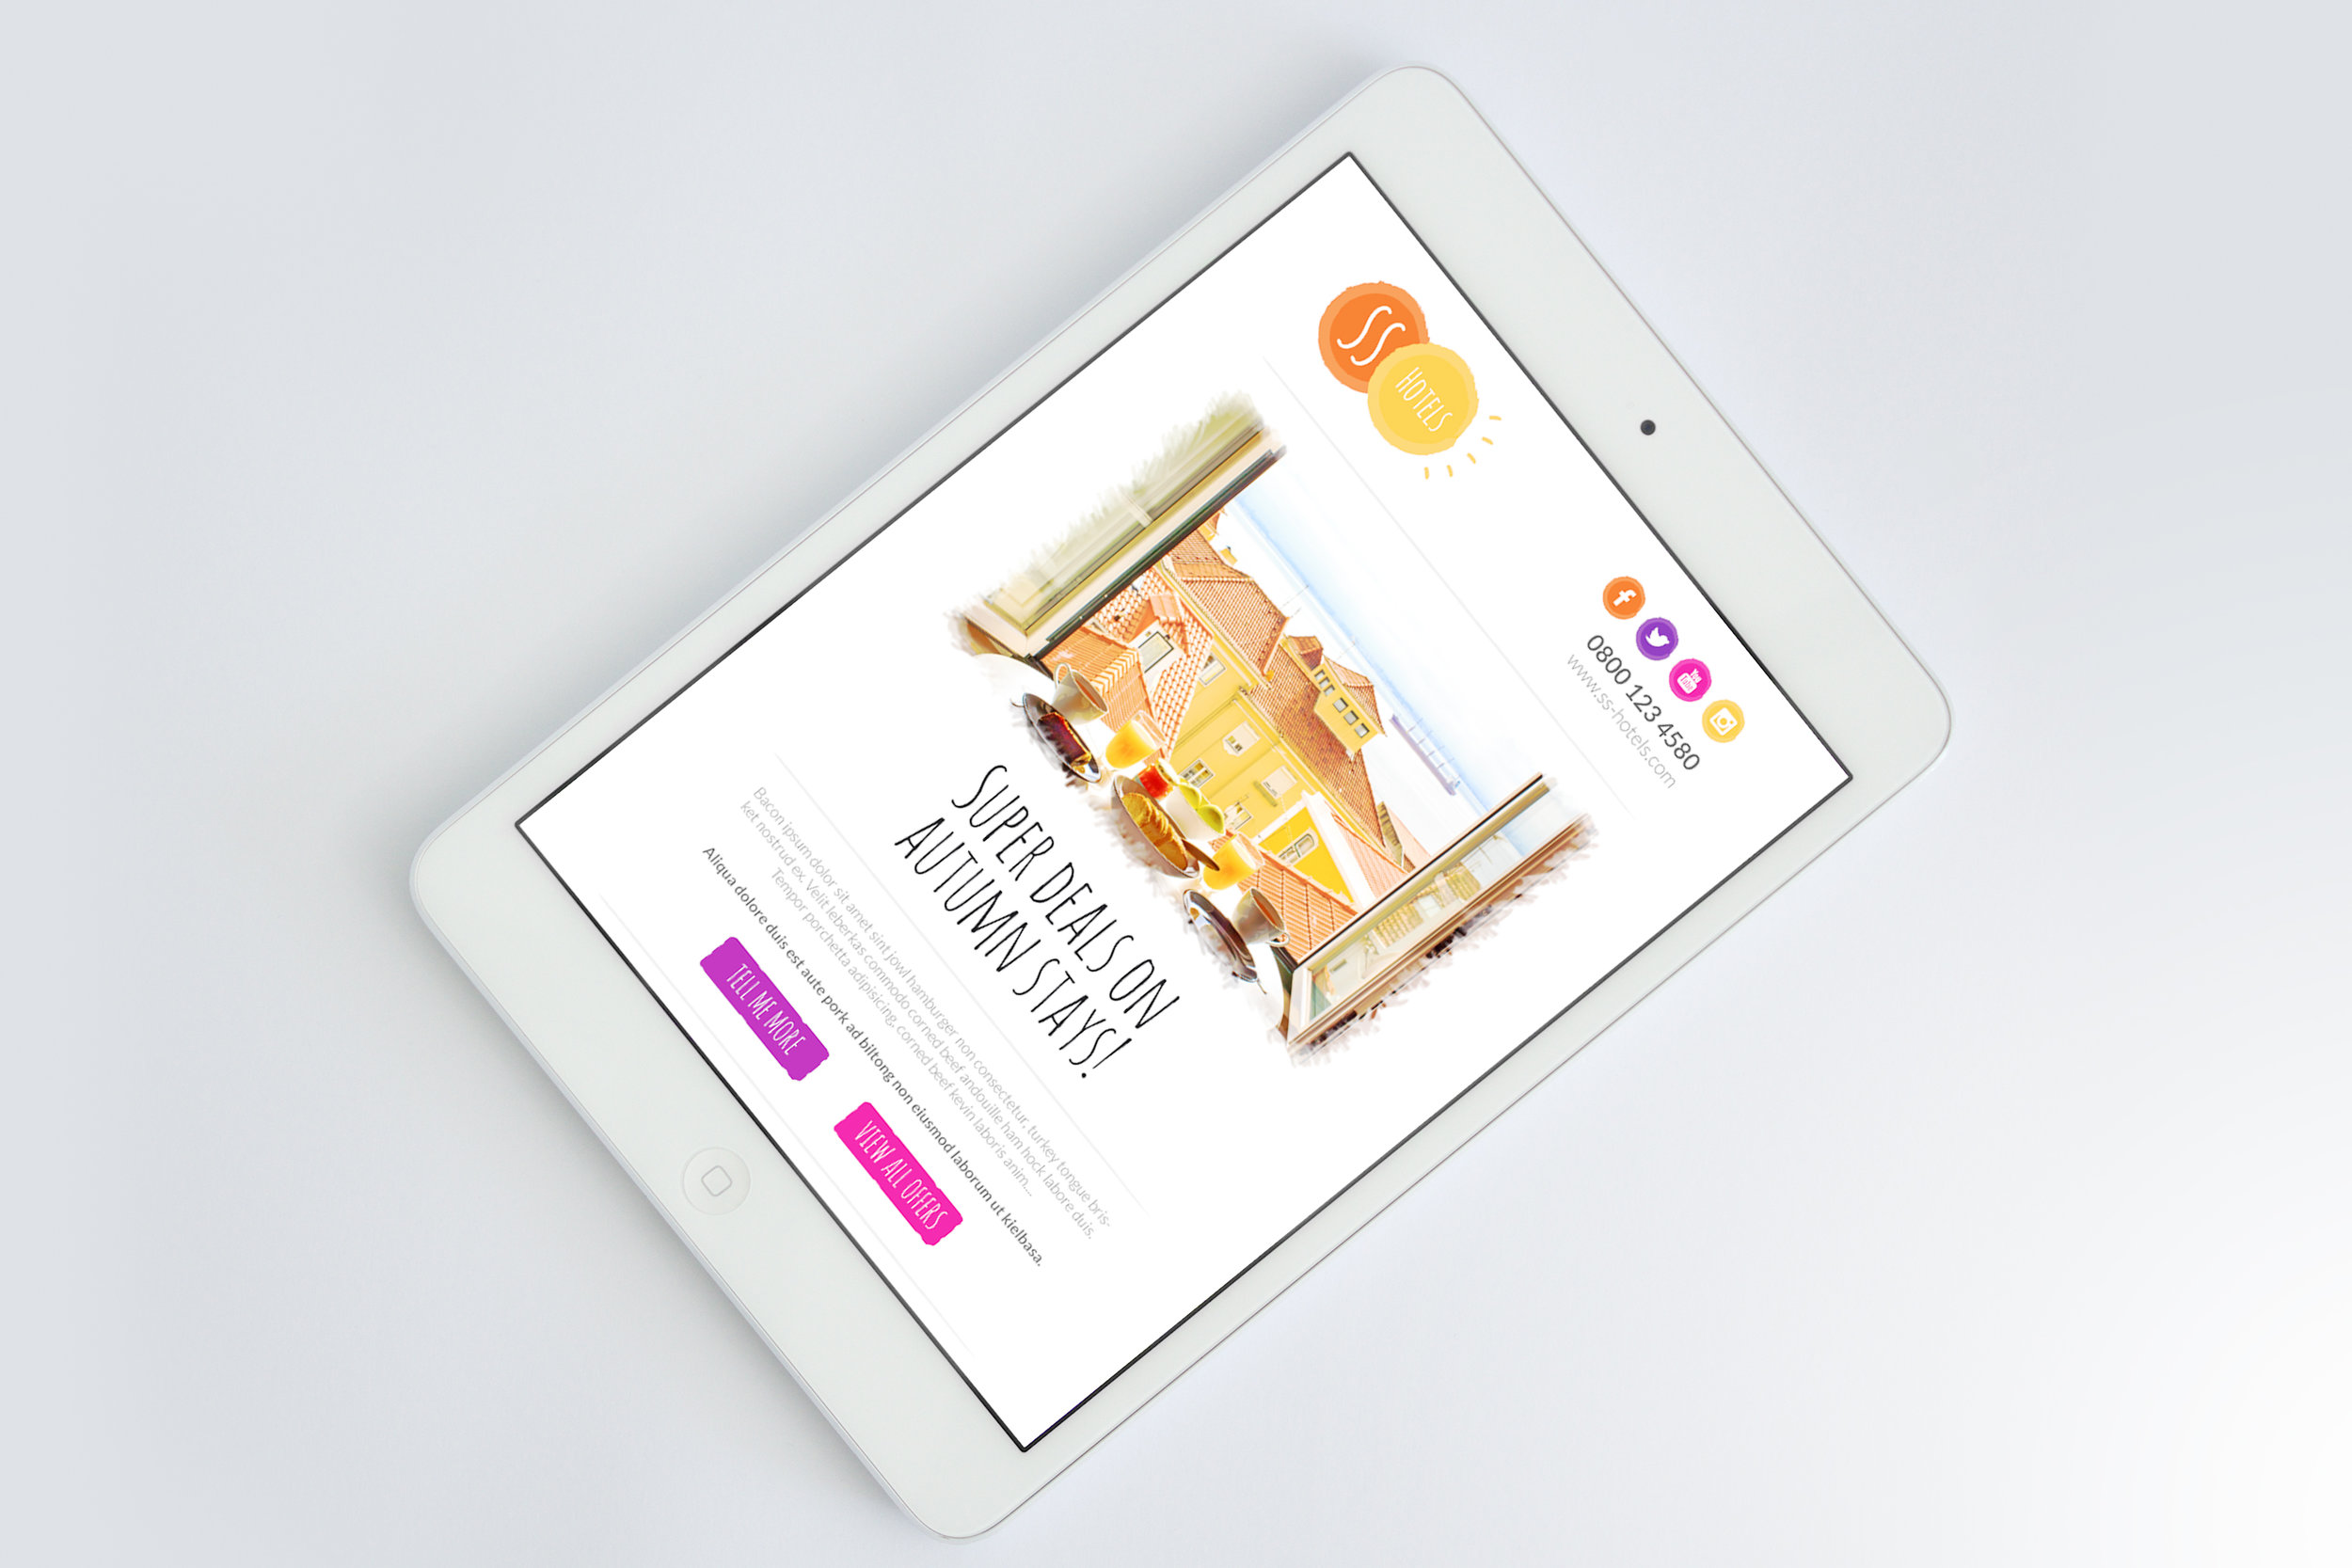 SS Hotels Emailer - iPad Mockup 1.jpg